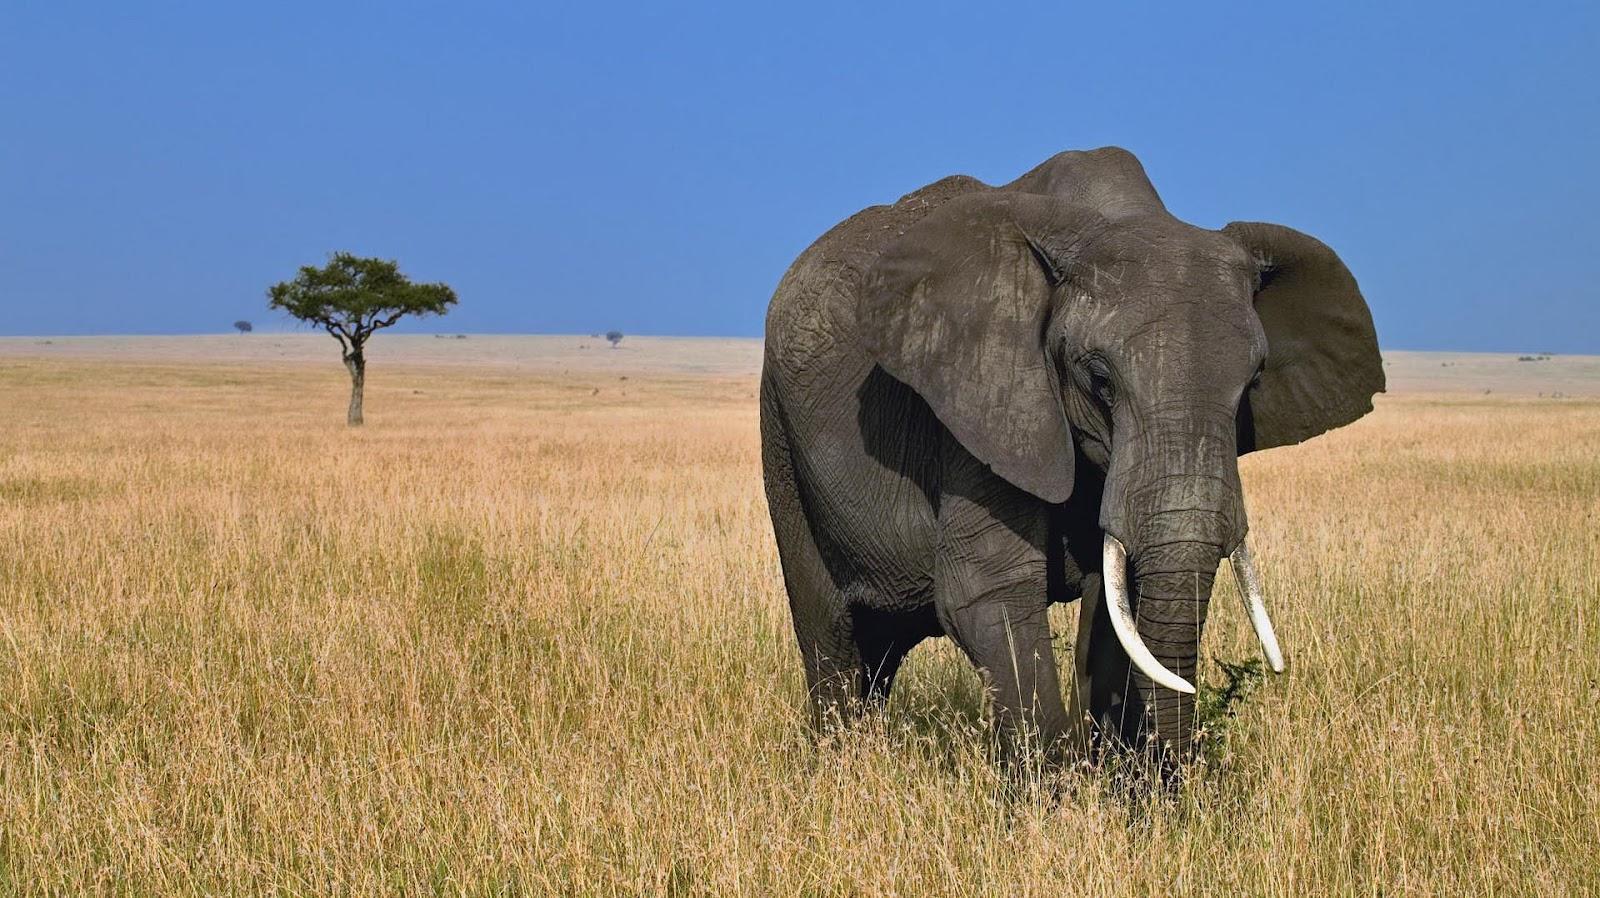 Must see Wallpaper High Quality Elephant - big-elephant-in-the-wild-hd-animal-wallpaper-elephants  Pic_463961.jpg